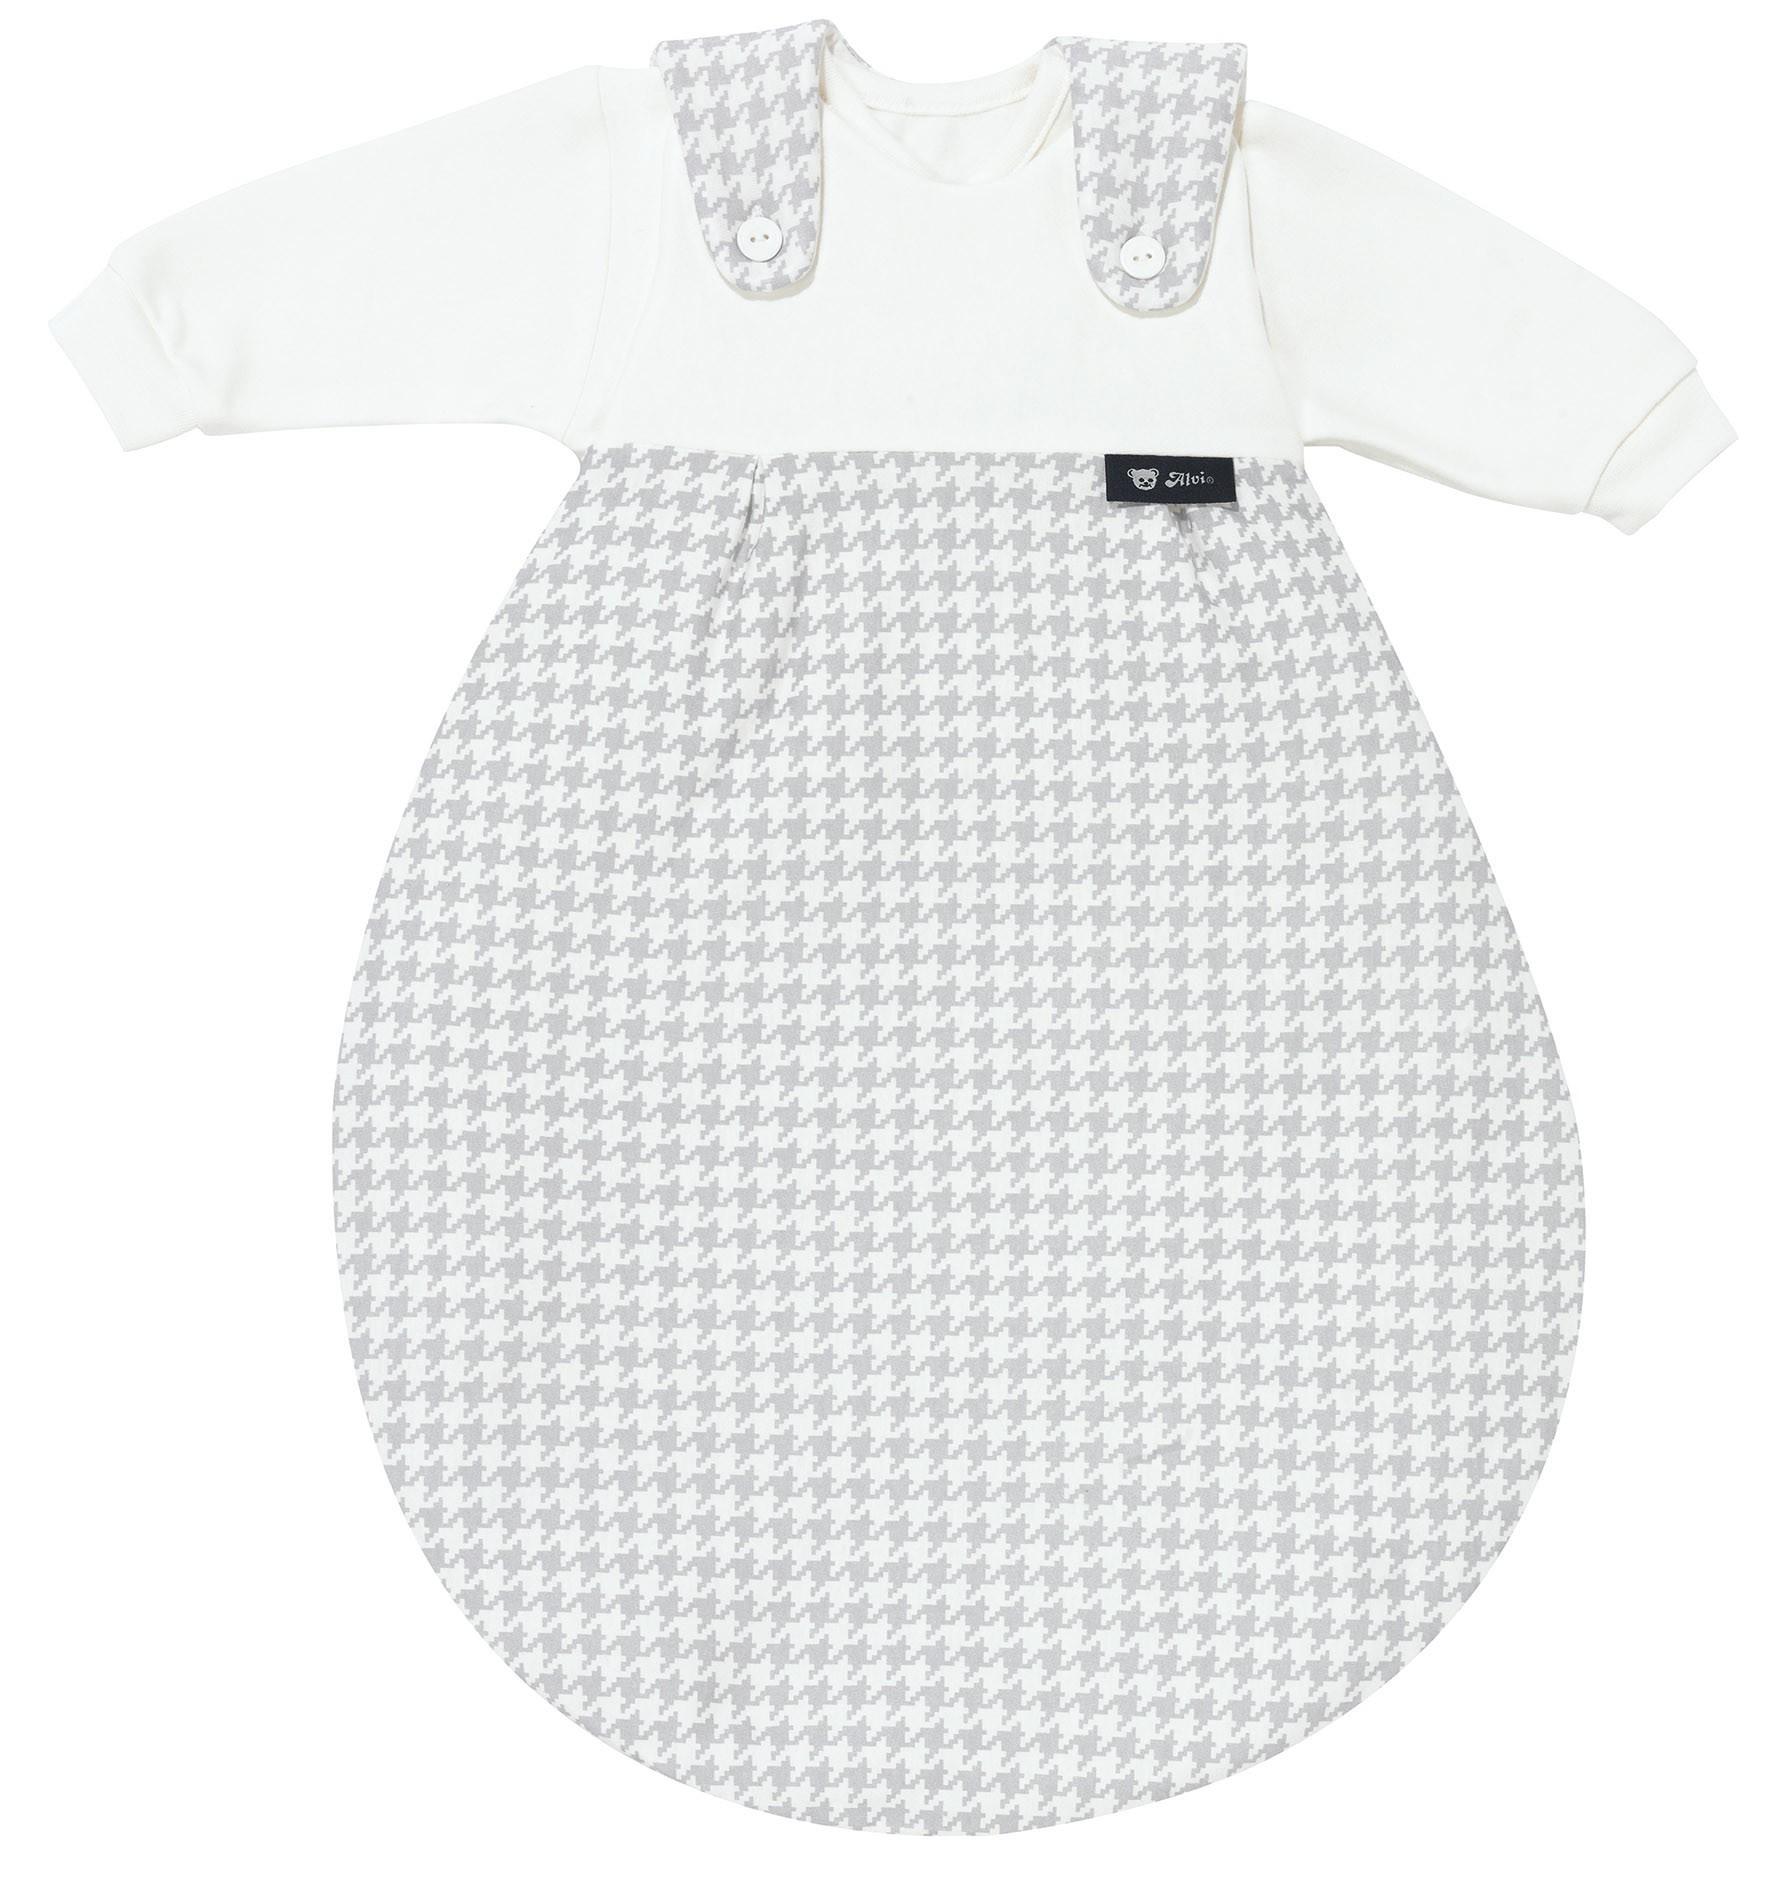 Alvi Baby Mäxchen 3tlg. Pepita silber 567-9